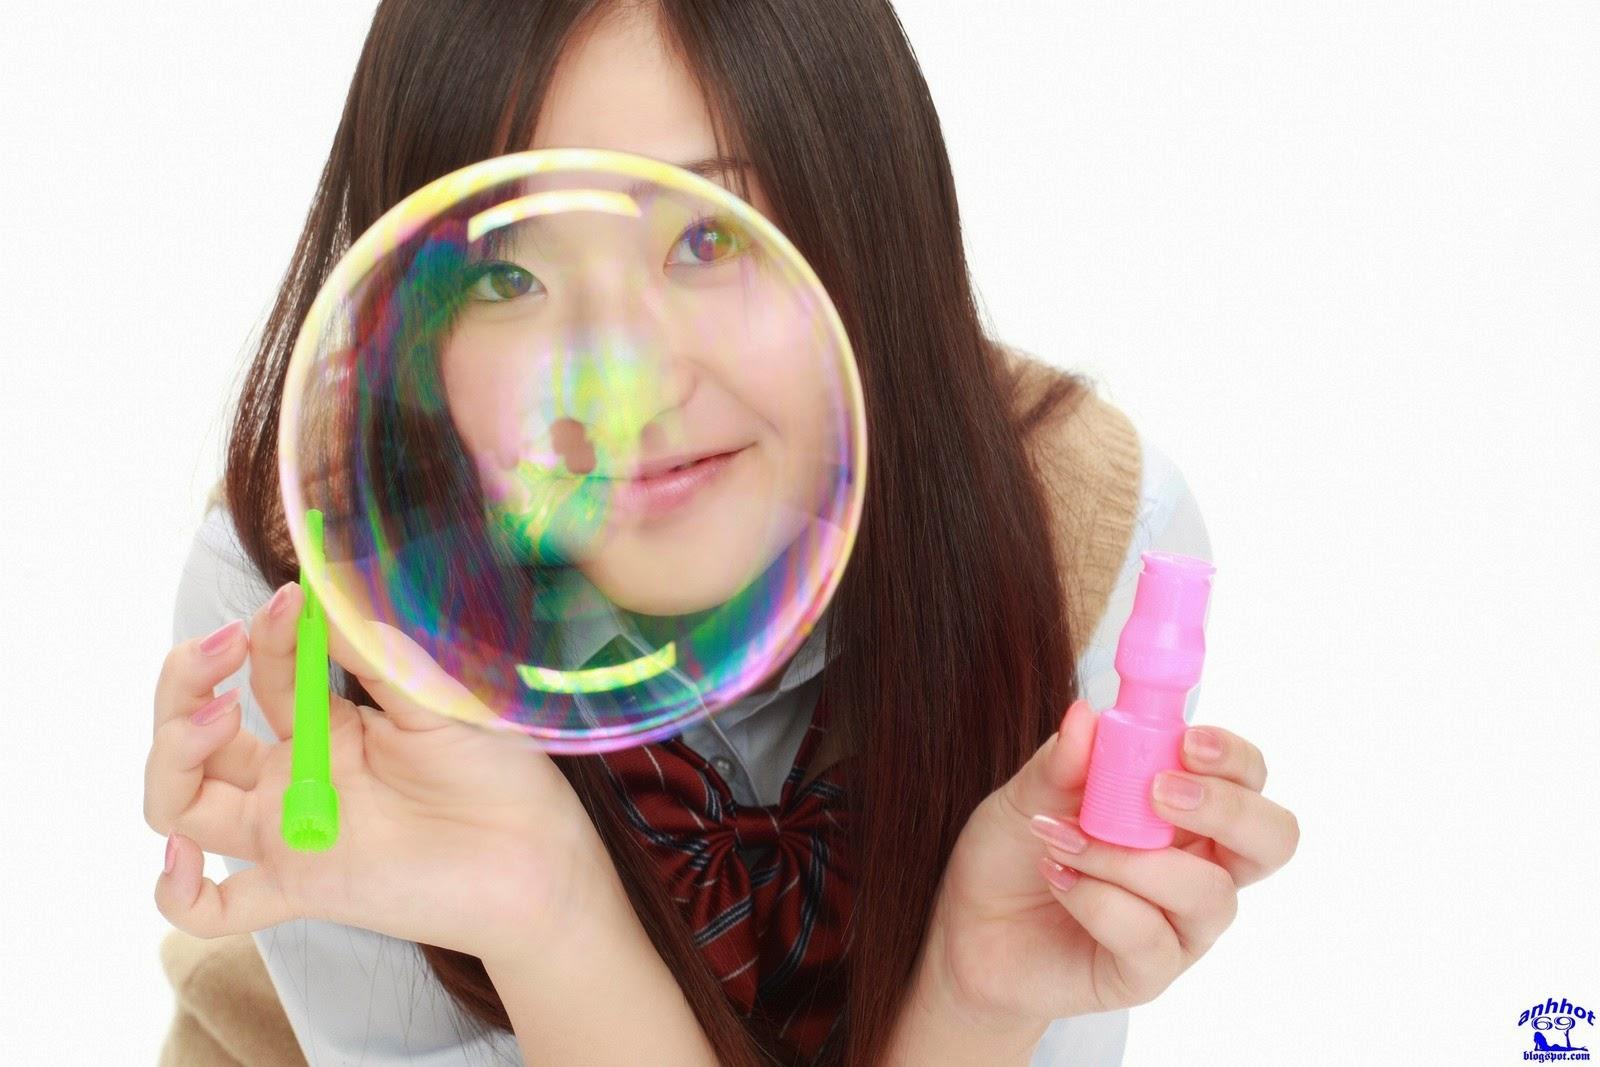 yuri-murakami-00562584